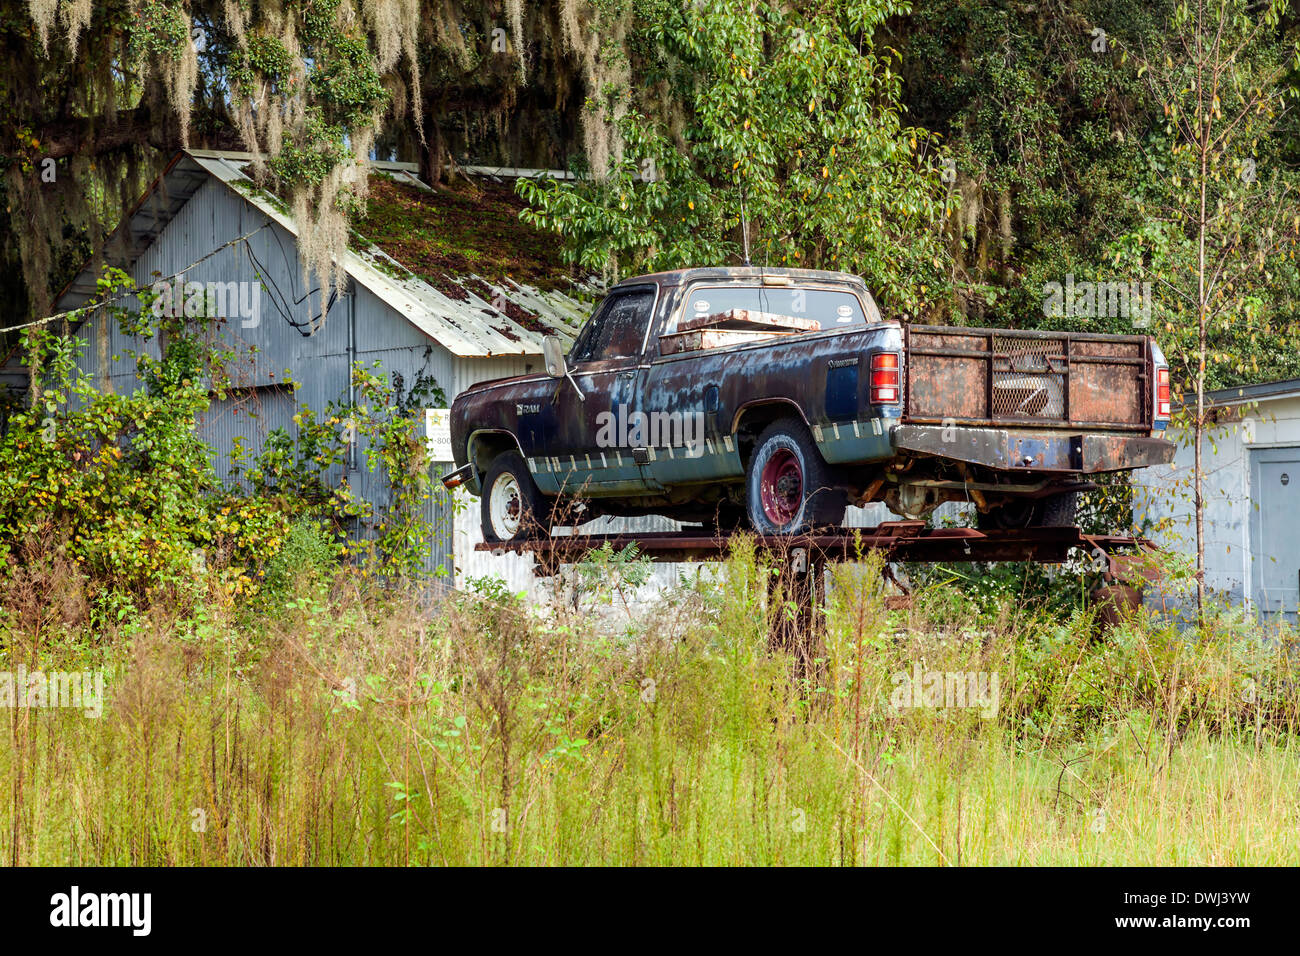 rundown-beat-up-rusting-pickup-truck-on-